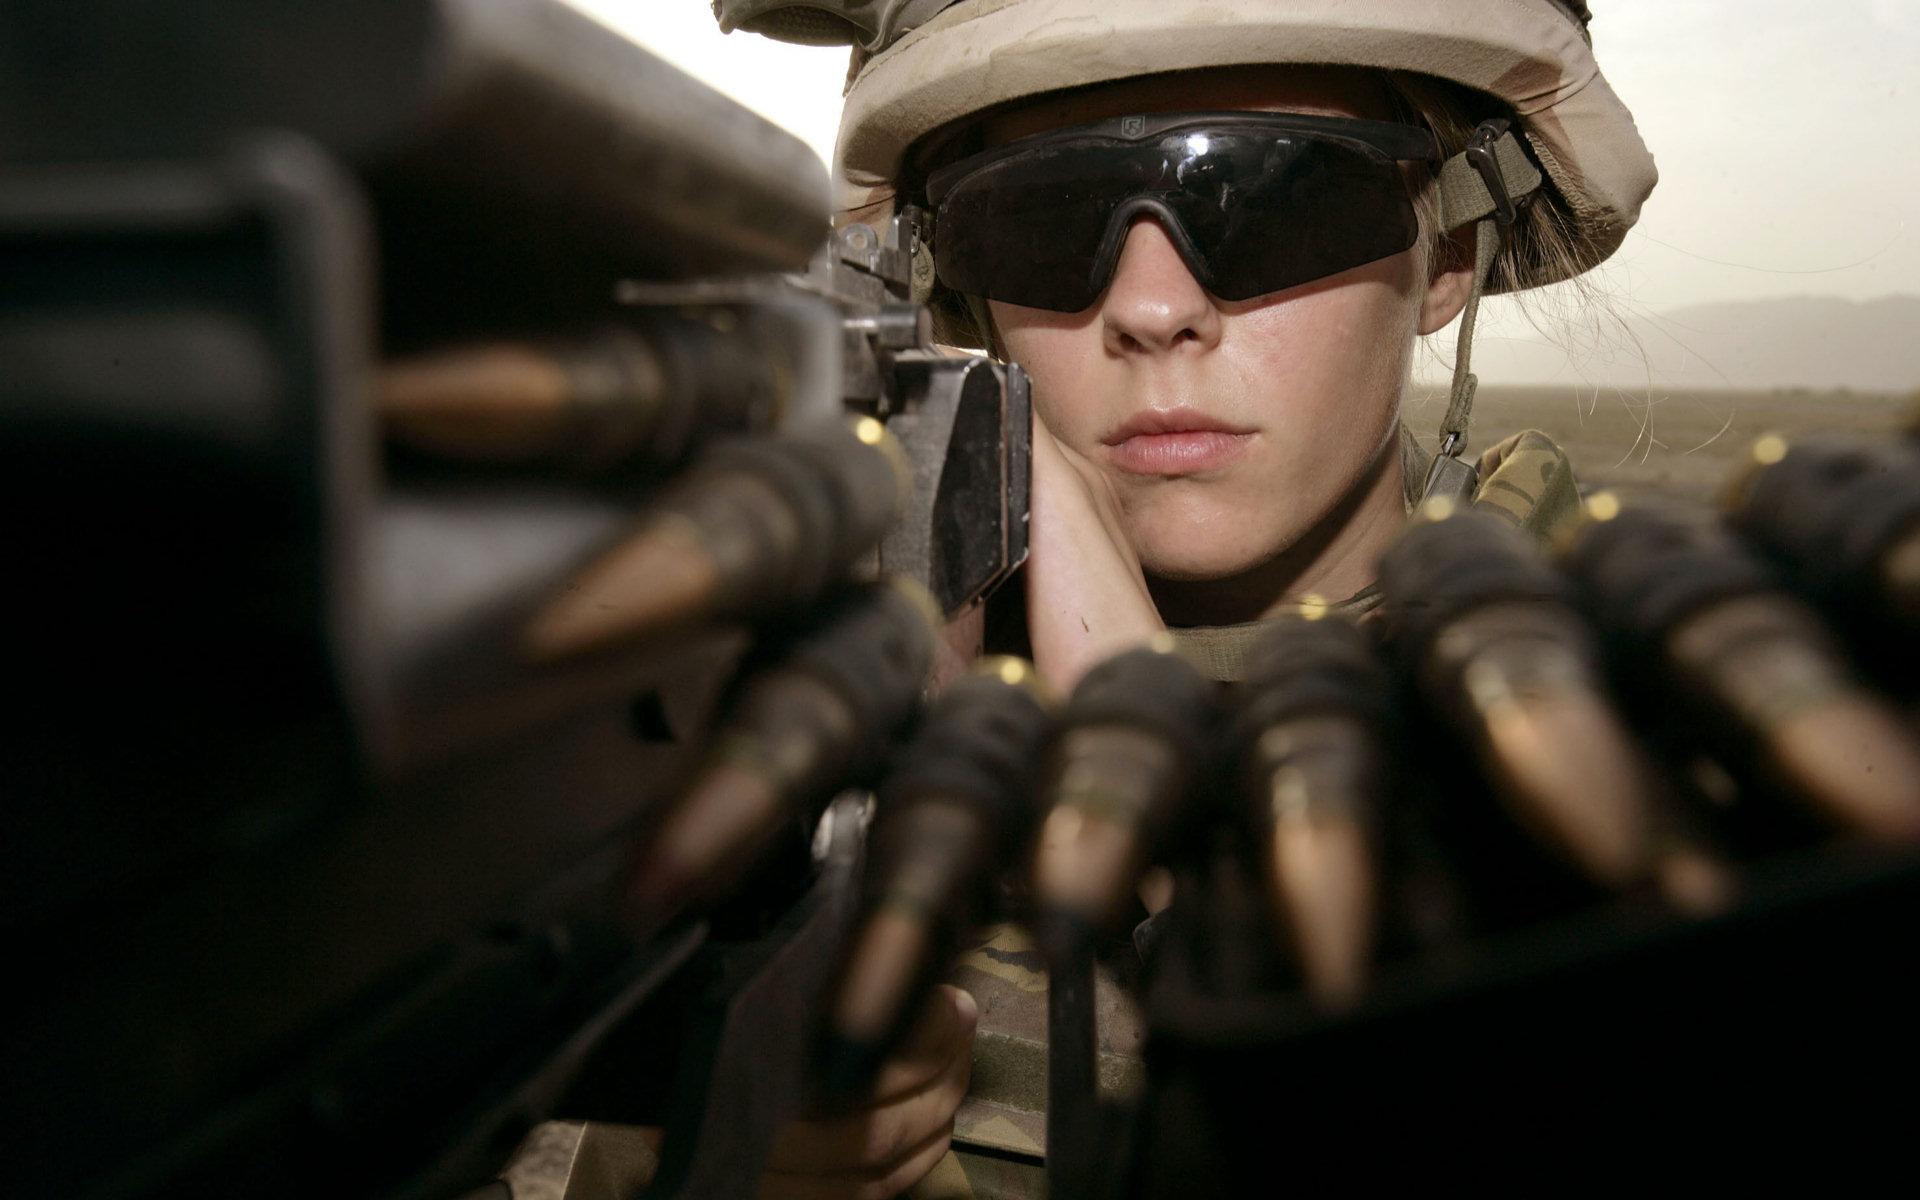 Female US Soldier